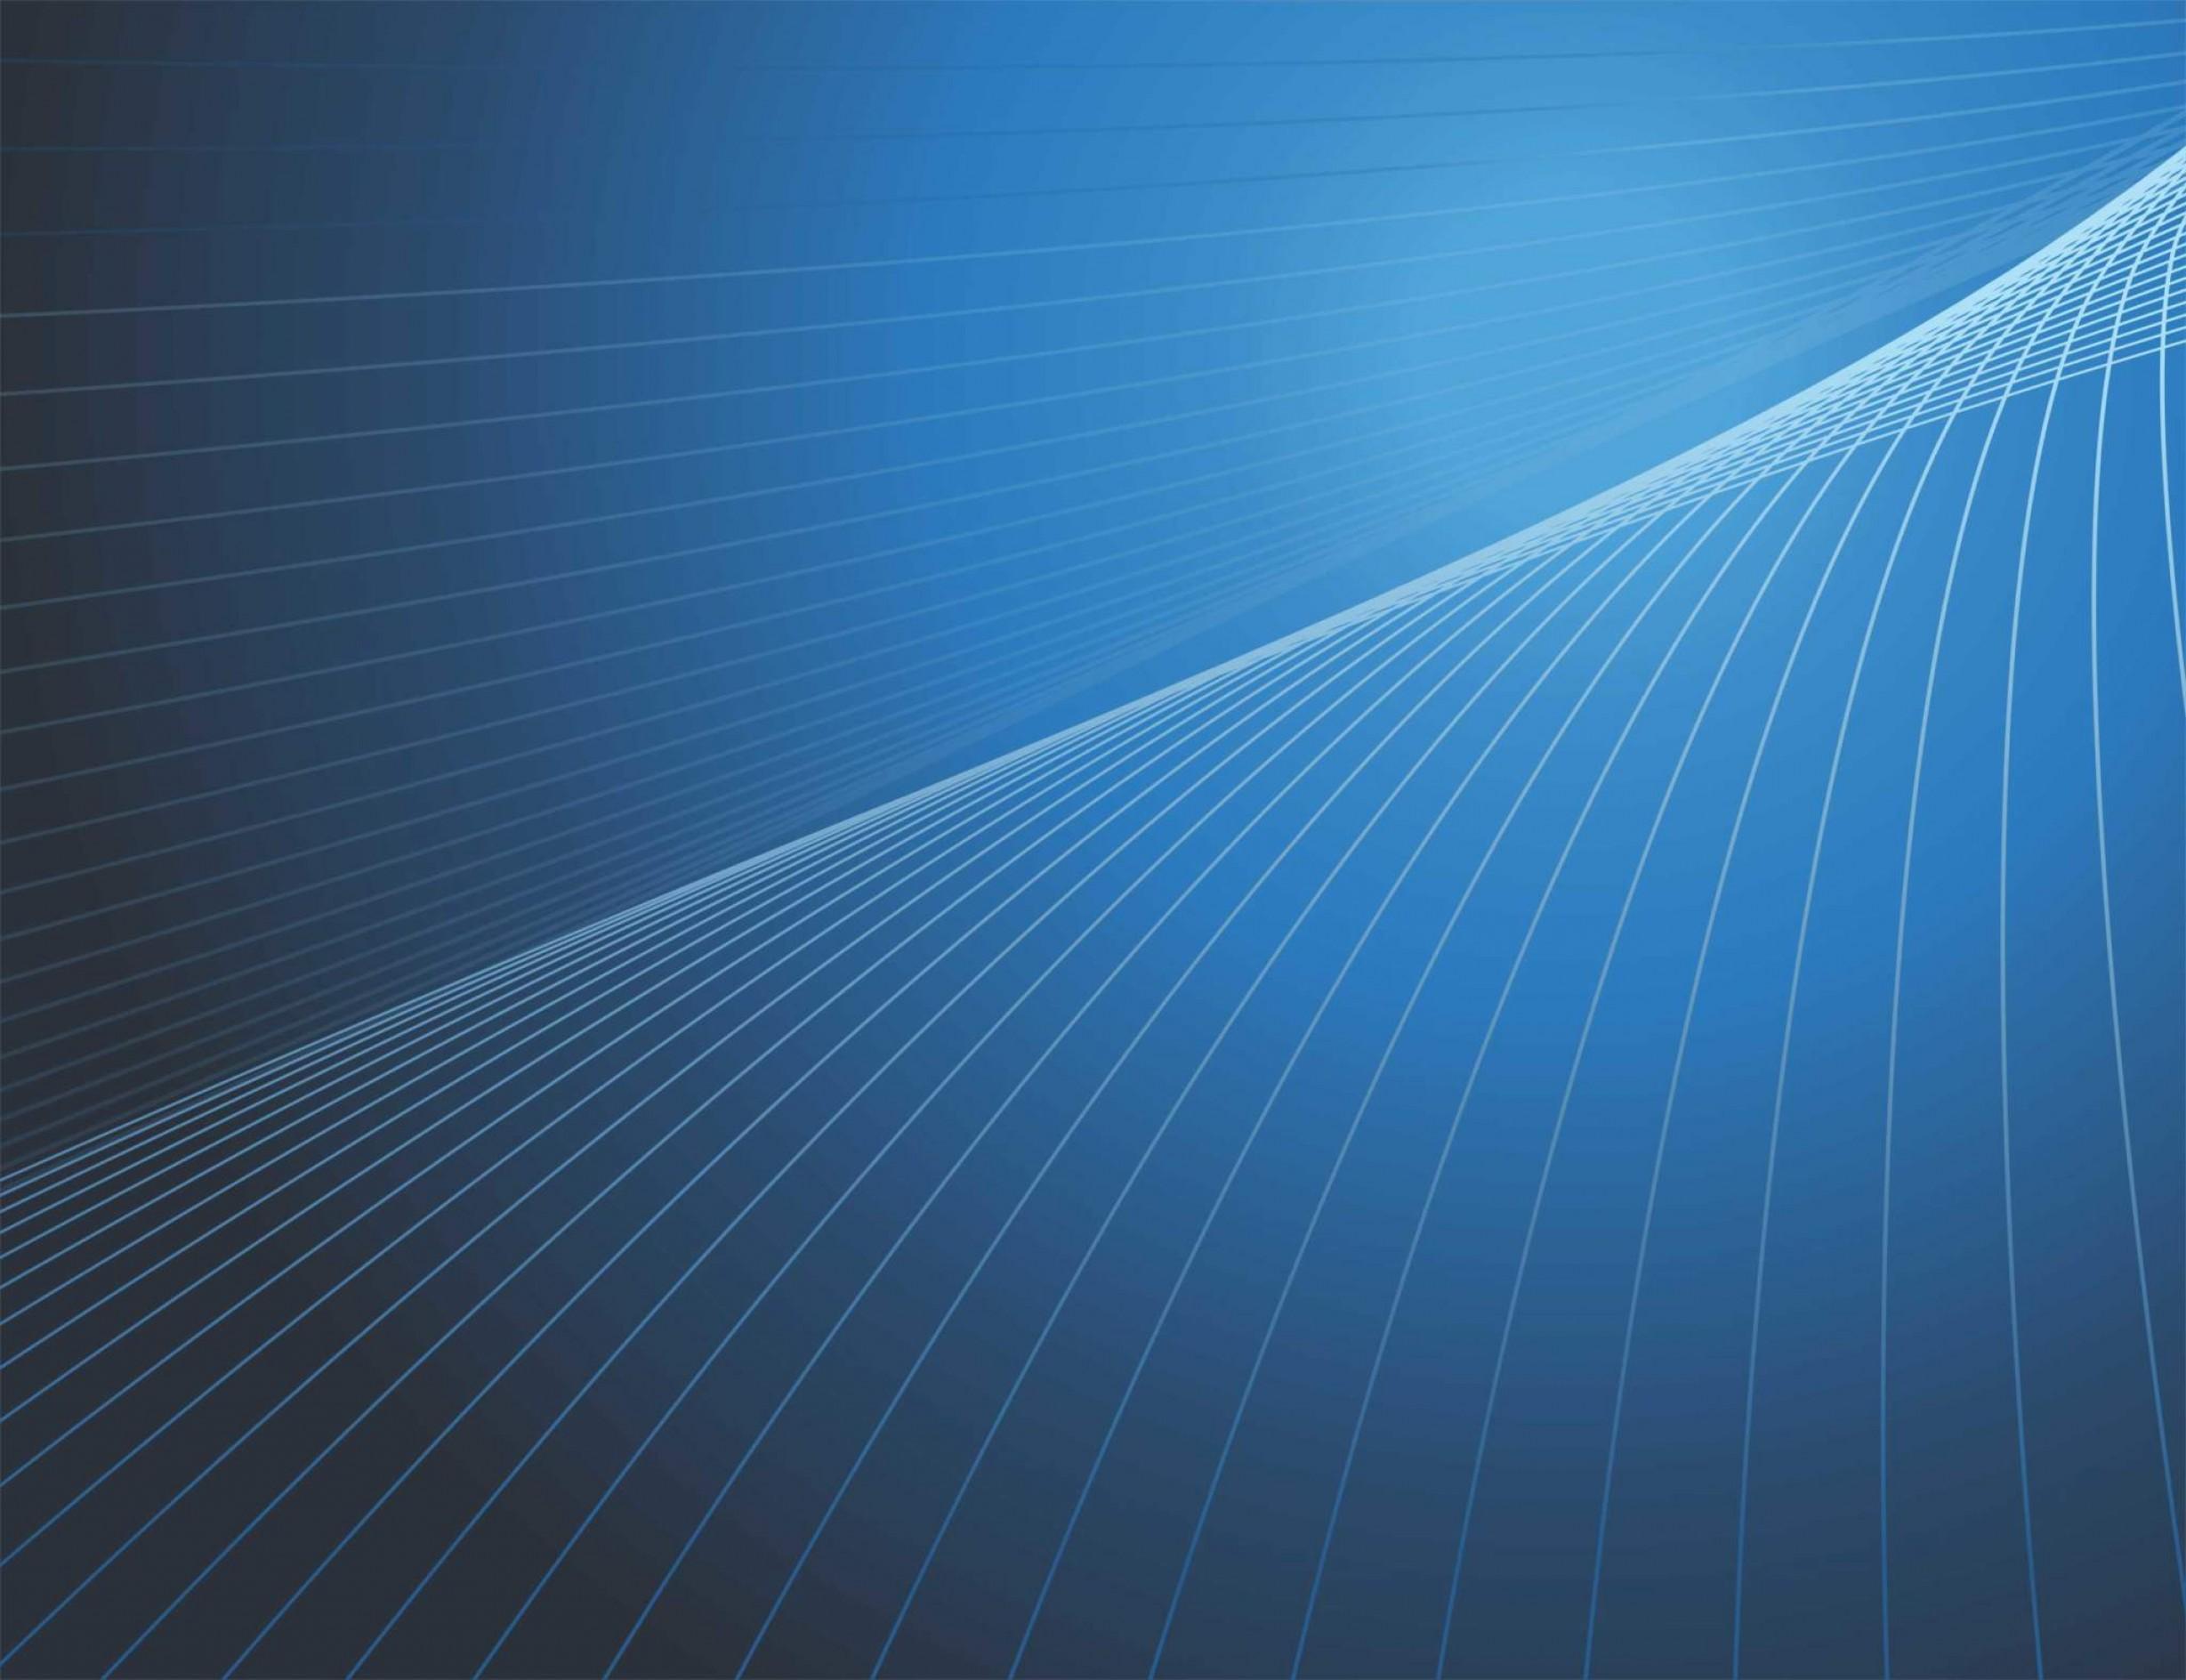 Corel draw x7 clipart download jpg transparent download Blue Vector Line Pattern Background Cdr File Coreldraw X ... jpg transparent download